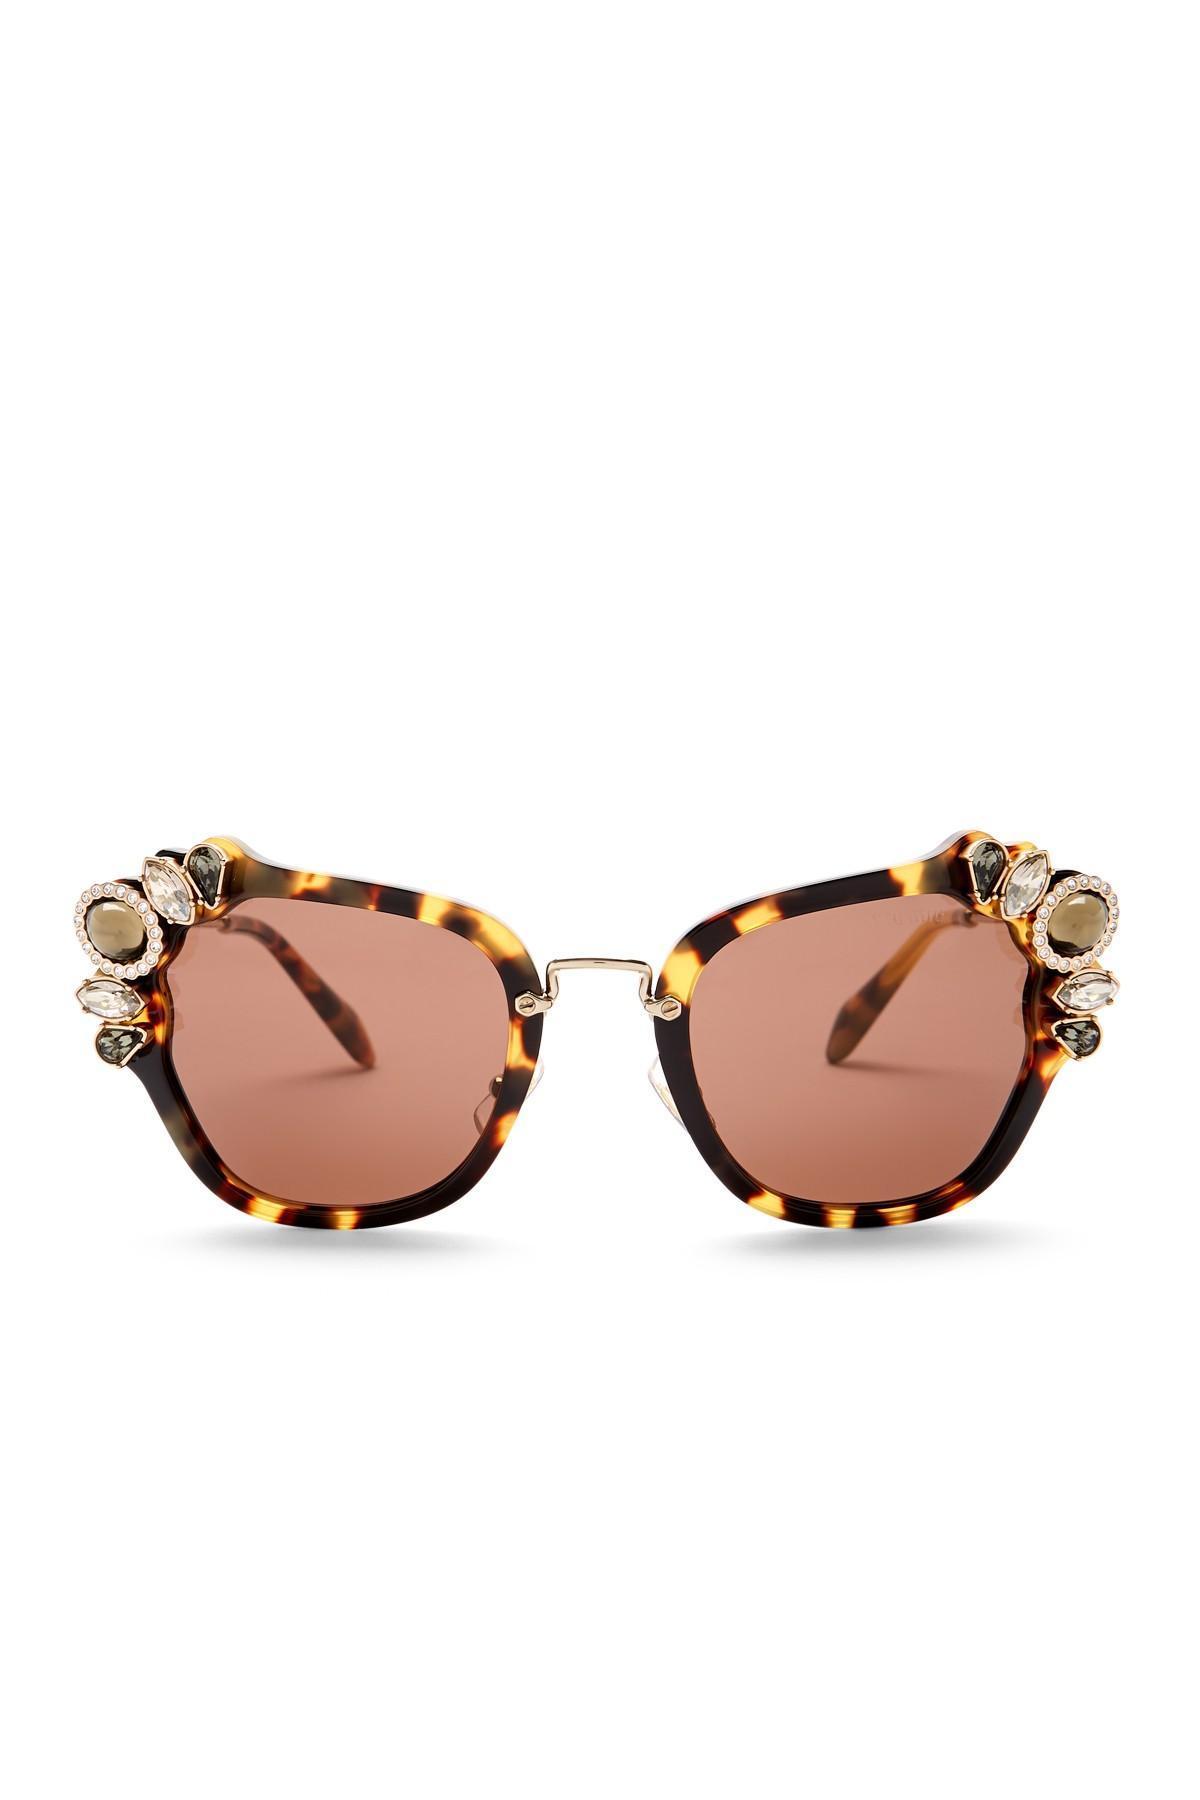 206b3dee68 Miu Miu Embellished Cat Eye 51mm Acetate Frame Sunglasses in Brown ...